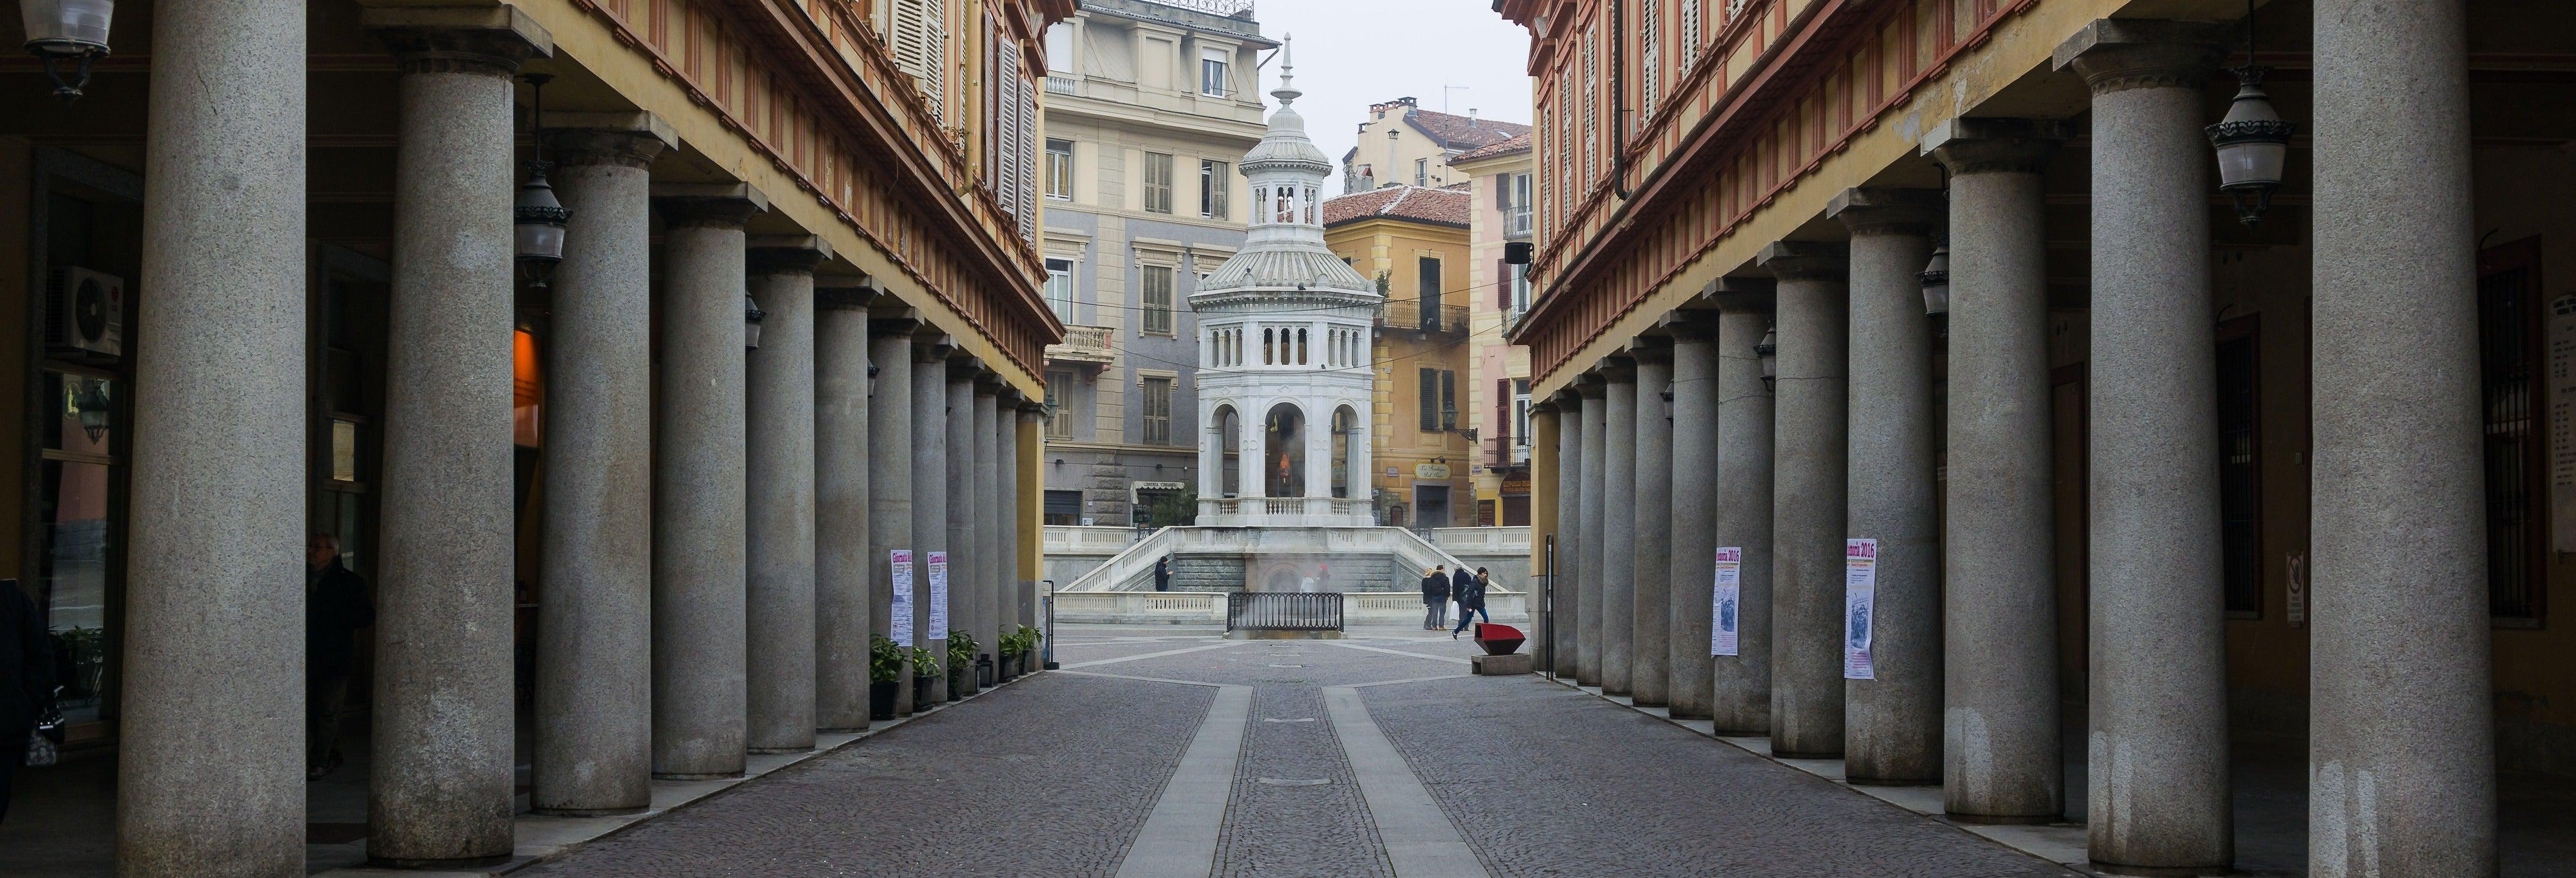 Acqui Terme Guided Tour